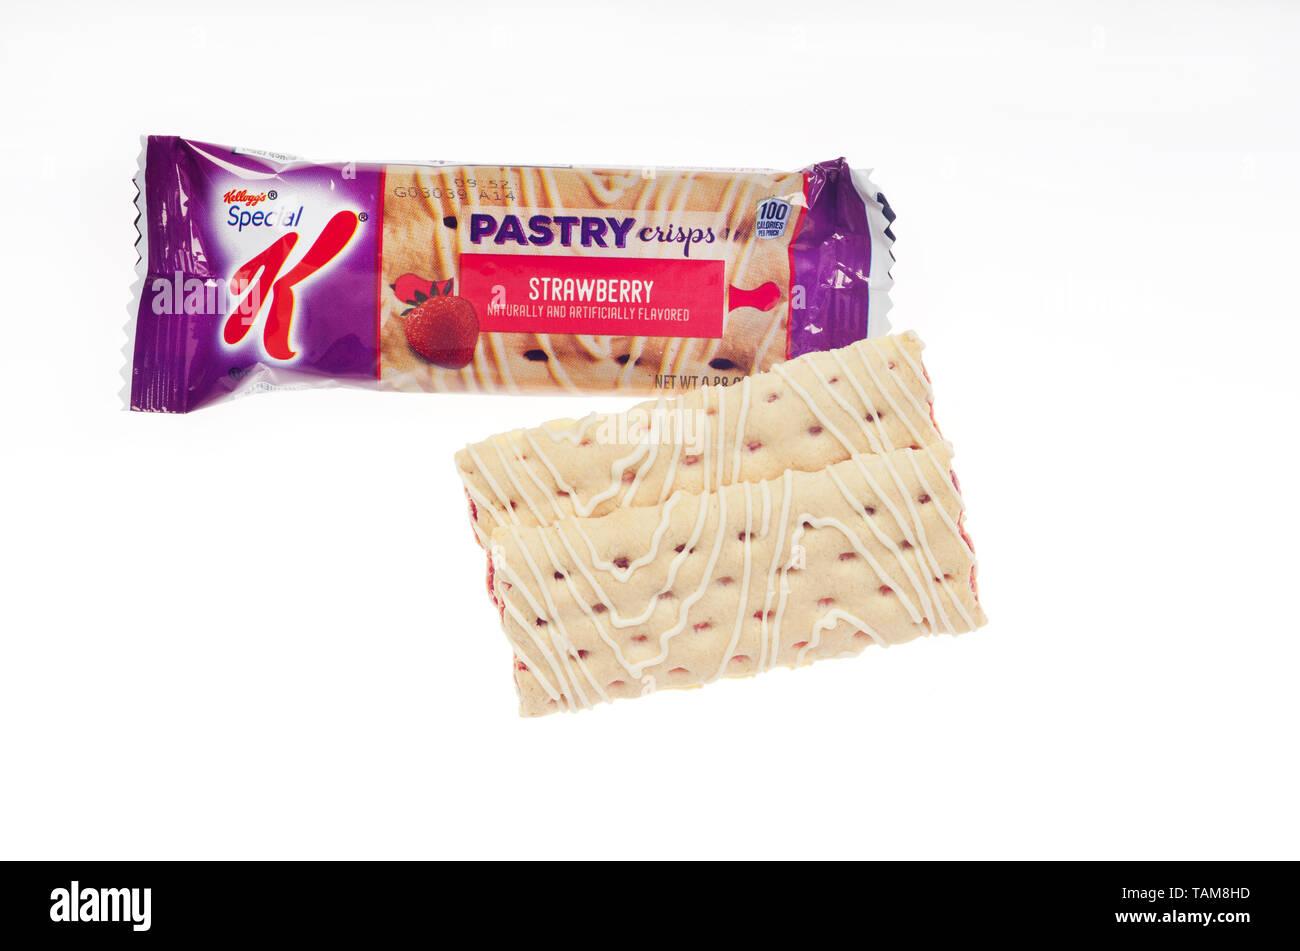 Kellogg's Special K Strawberry Pastry Crisp bar - Stock Image